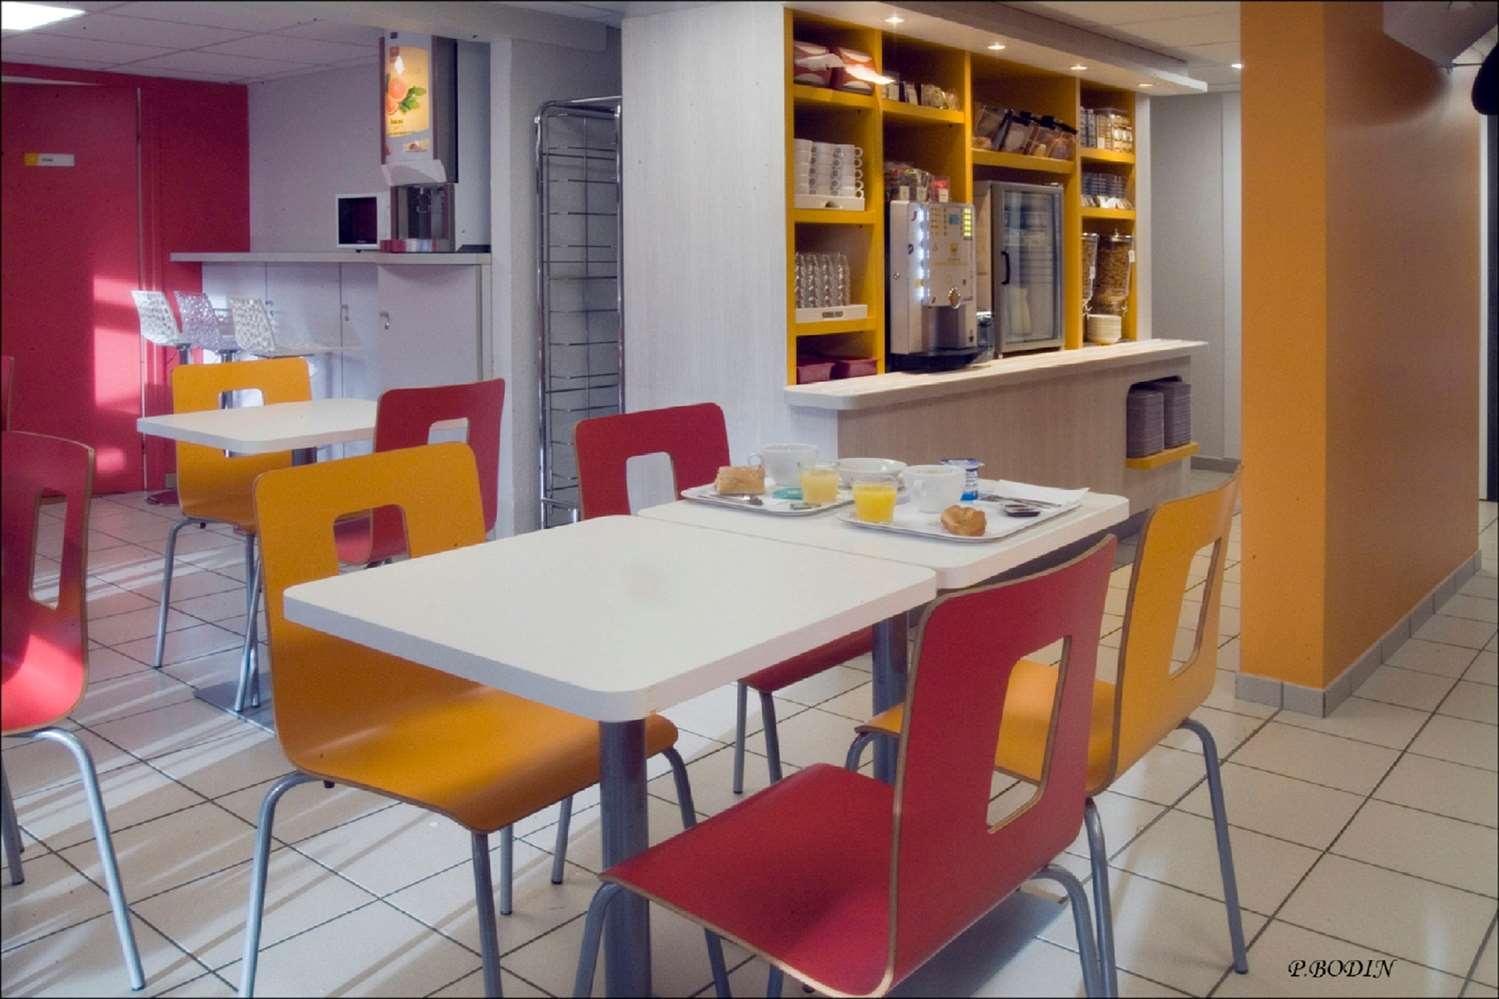 Restaurant - Hotel Premiere Classe Vichy - Bellerive Sur Allier